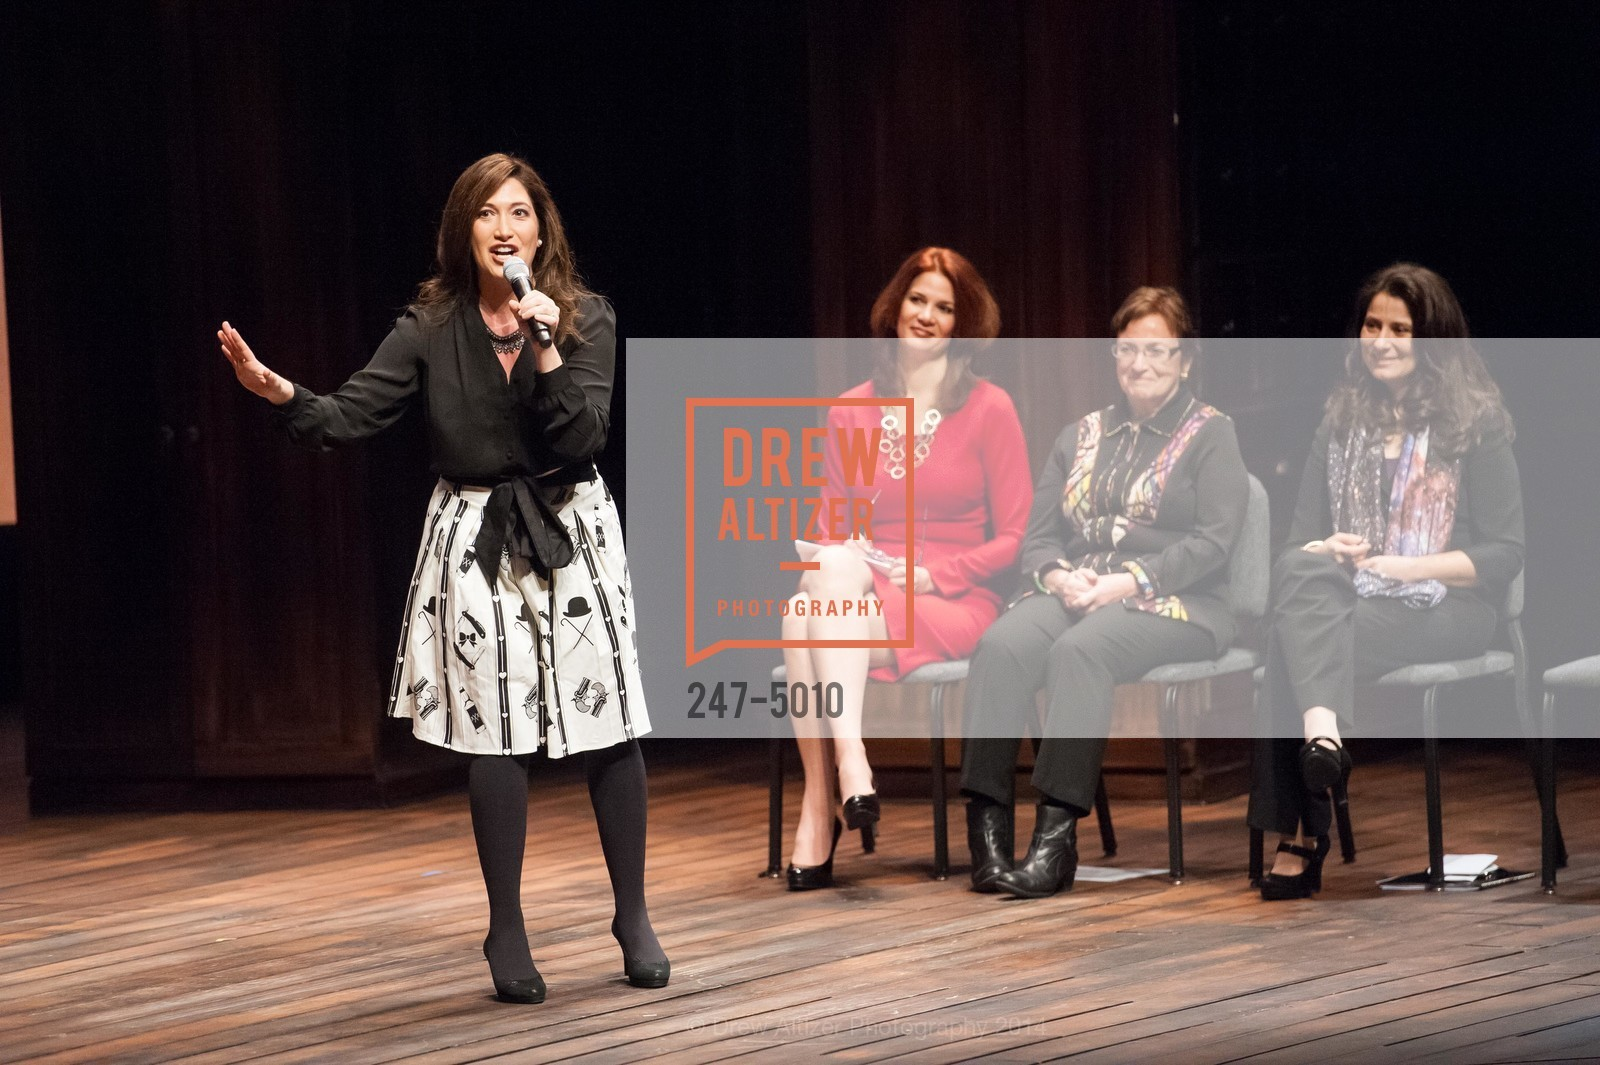 Randi Zuckerberg, Jenny Dearborn, Ann Bowers, Natalie Batalha, Photo #247-5010